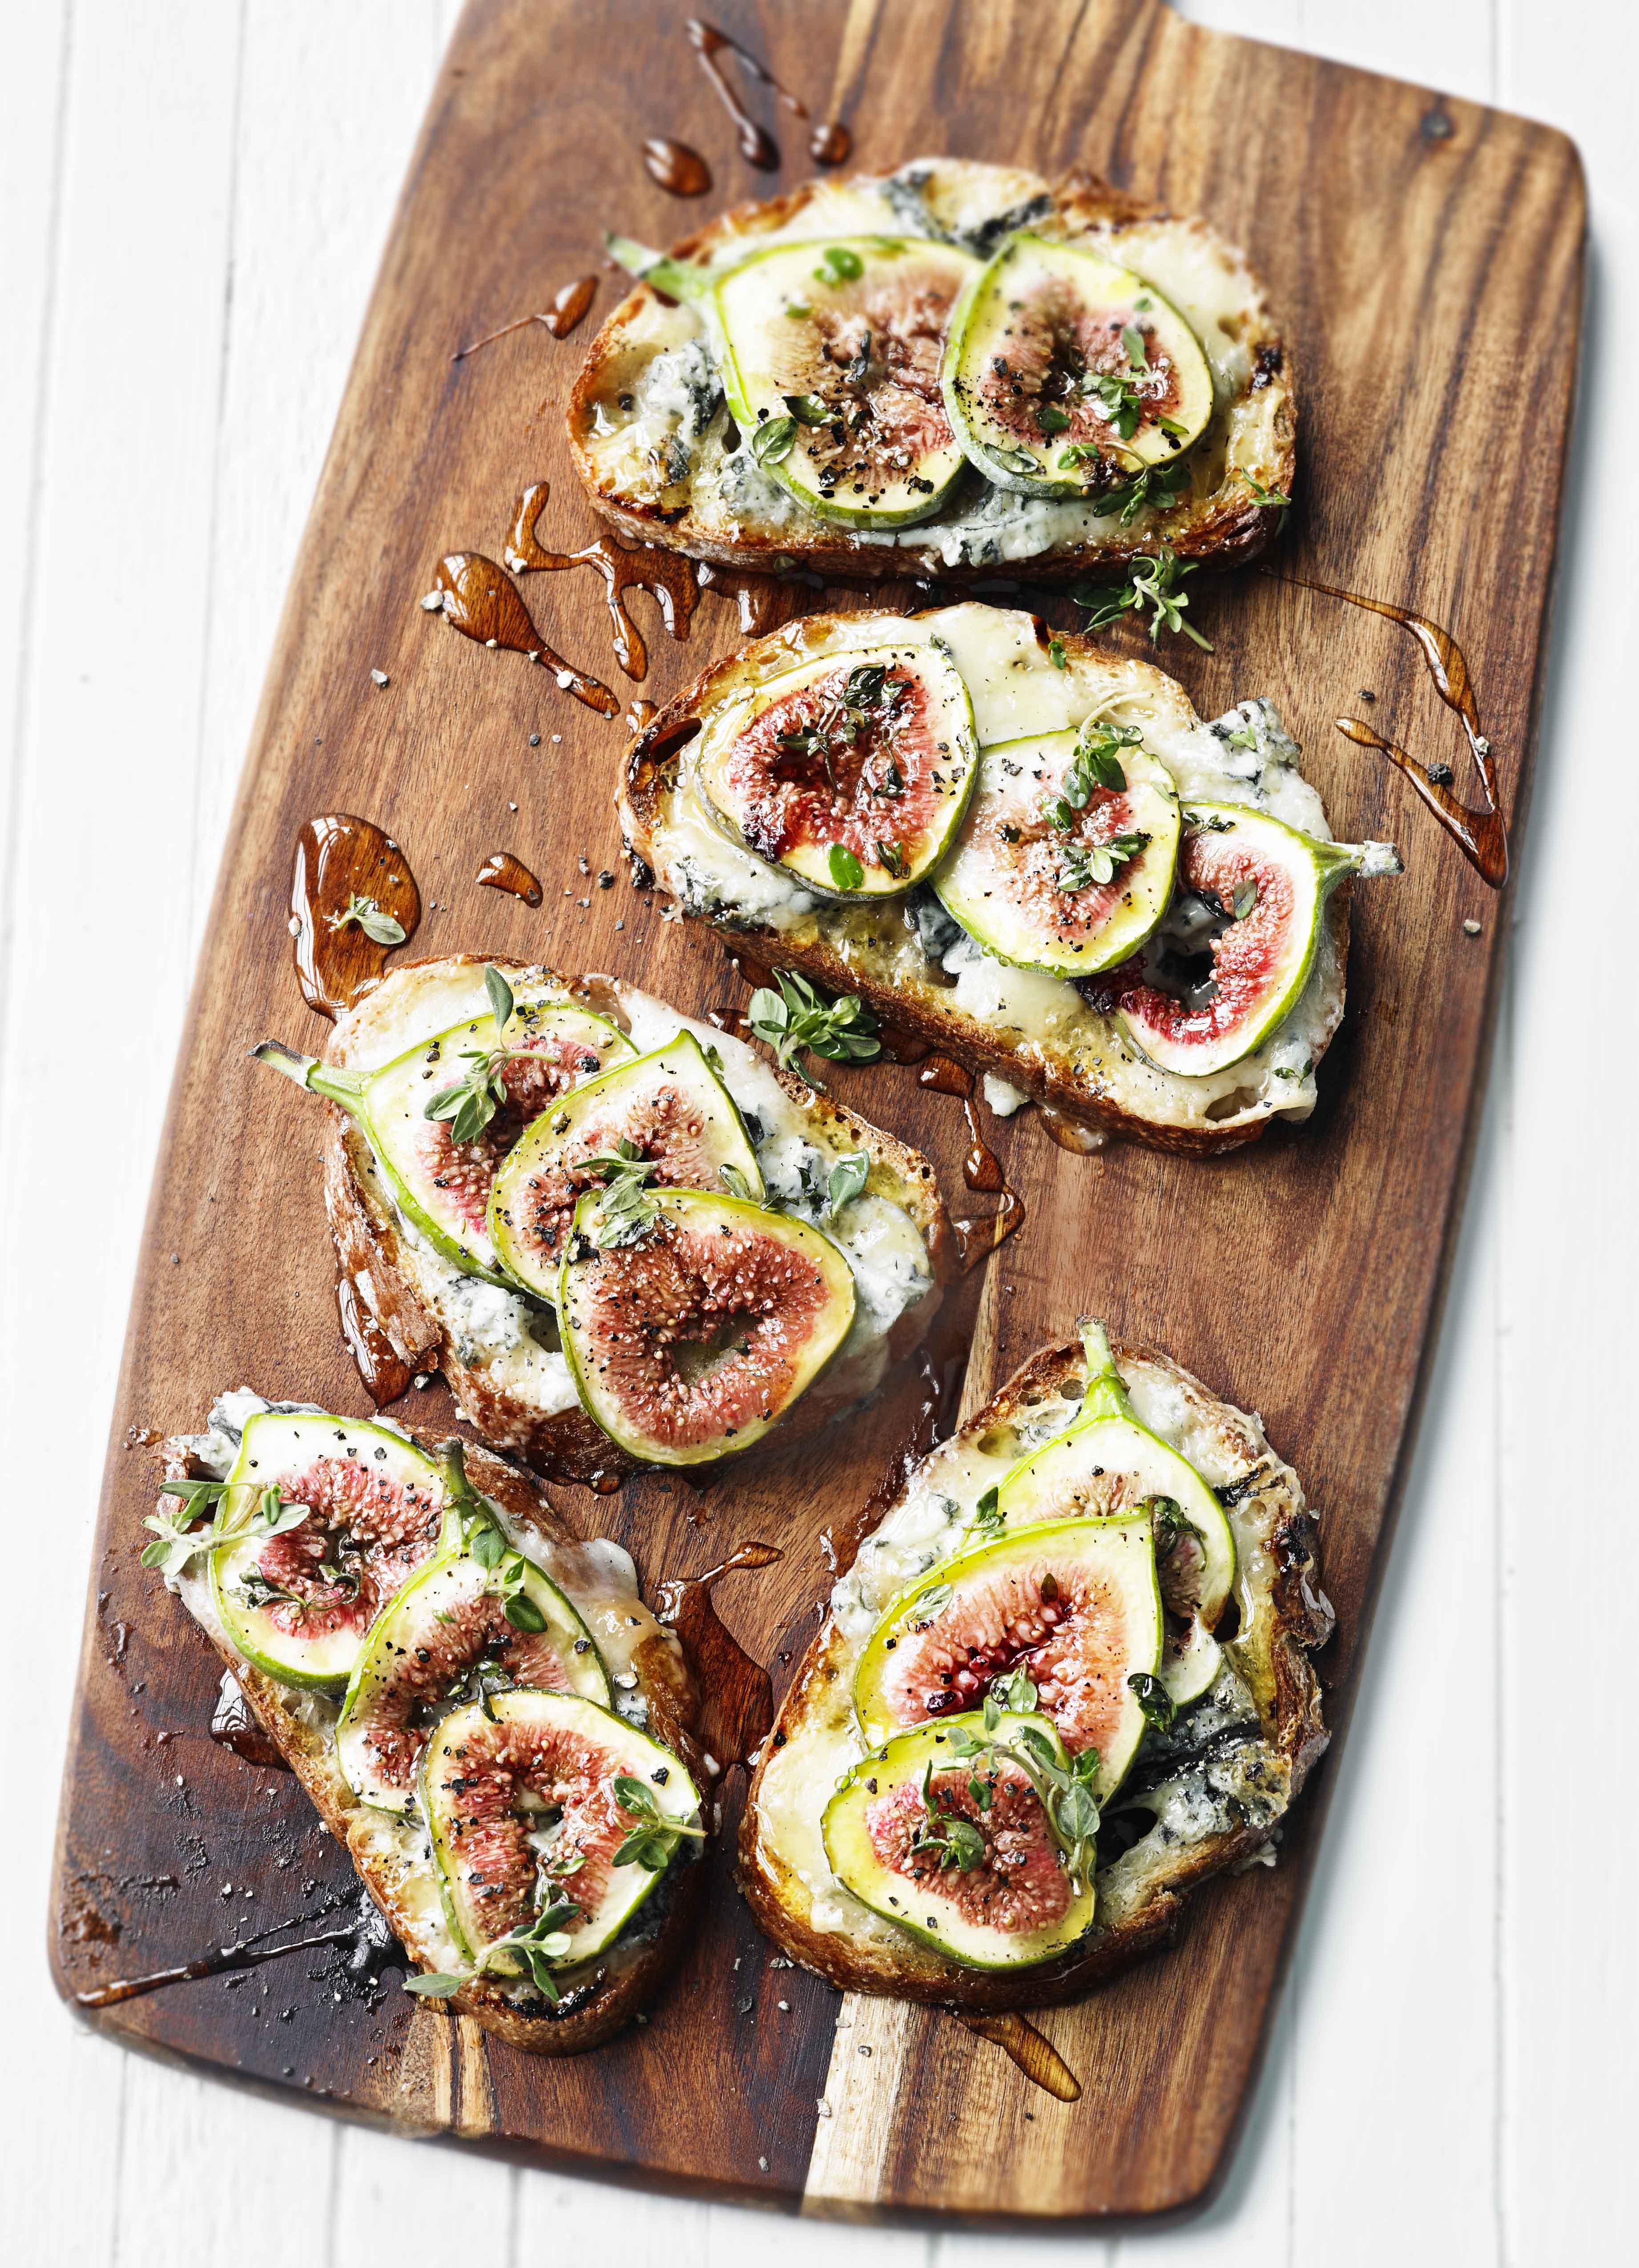 Tartine Recipe With Figs and Gorgonzola